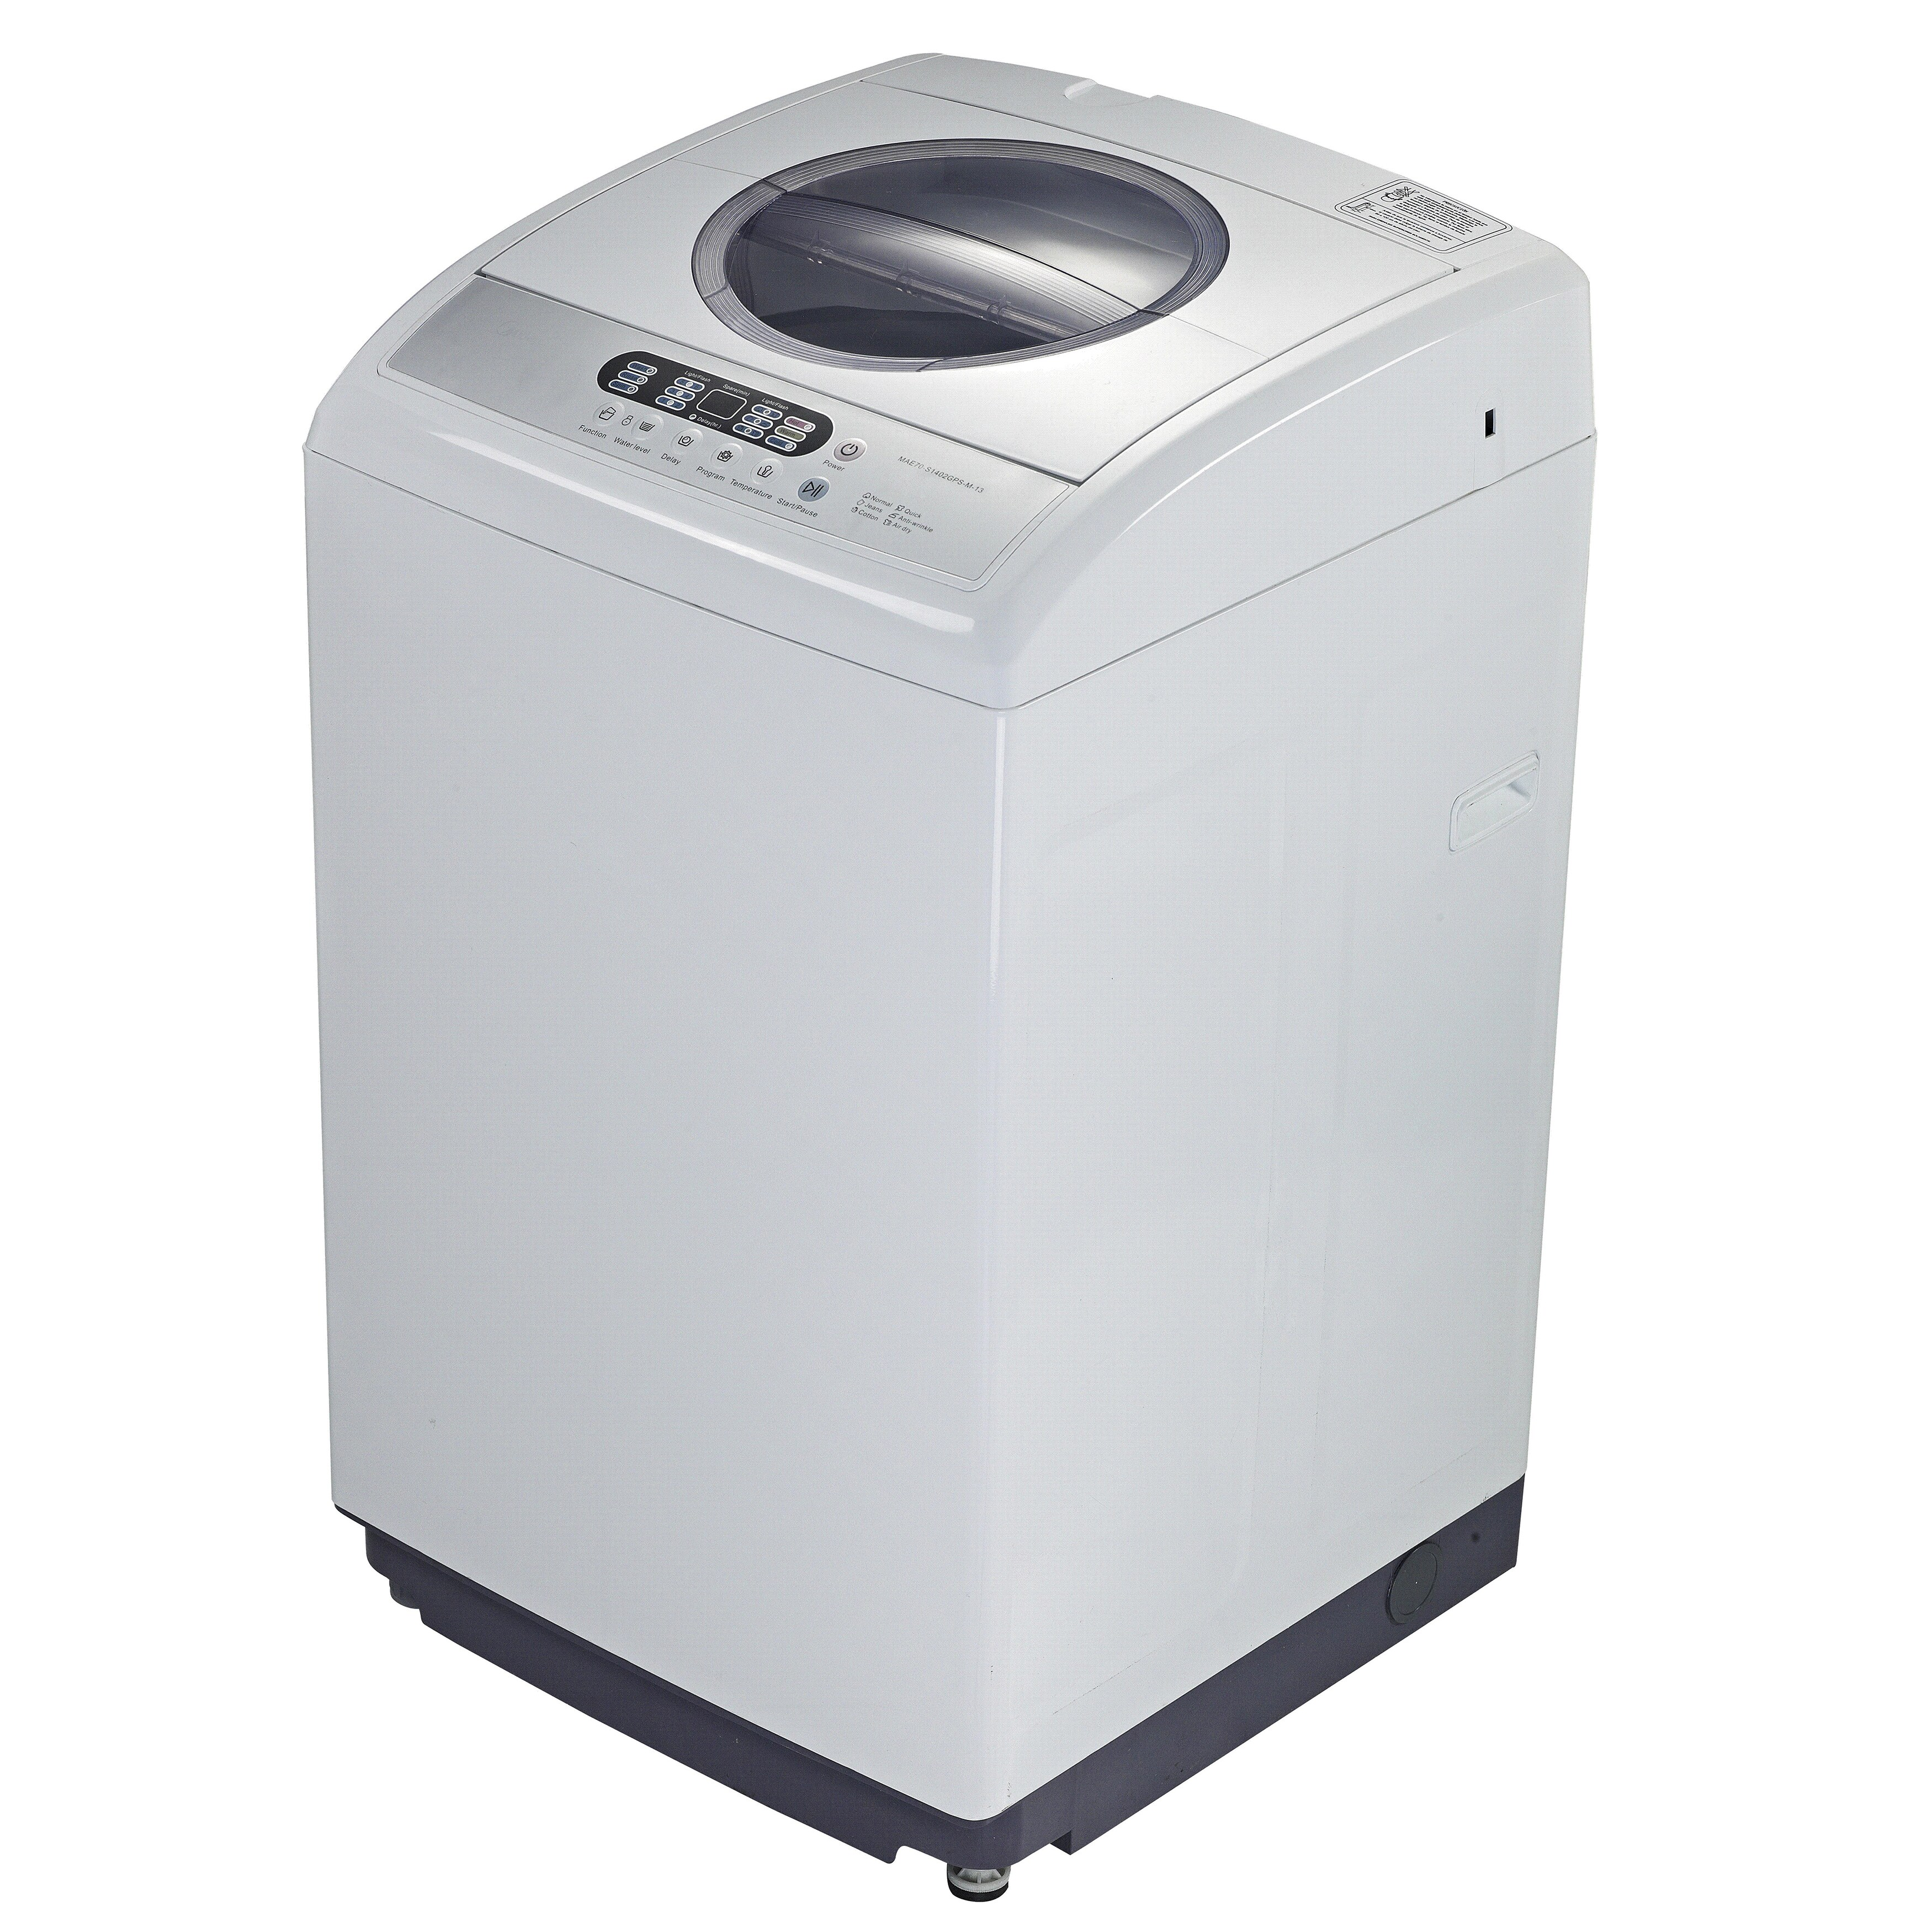 RCA 2.1 Cubic-Foot Portable Washing Machine